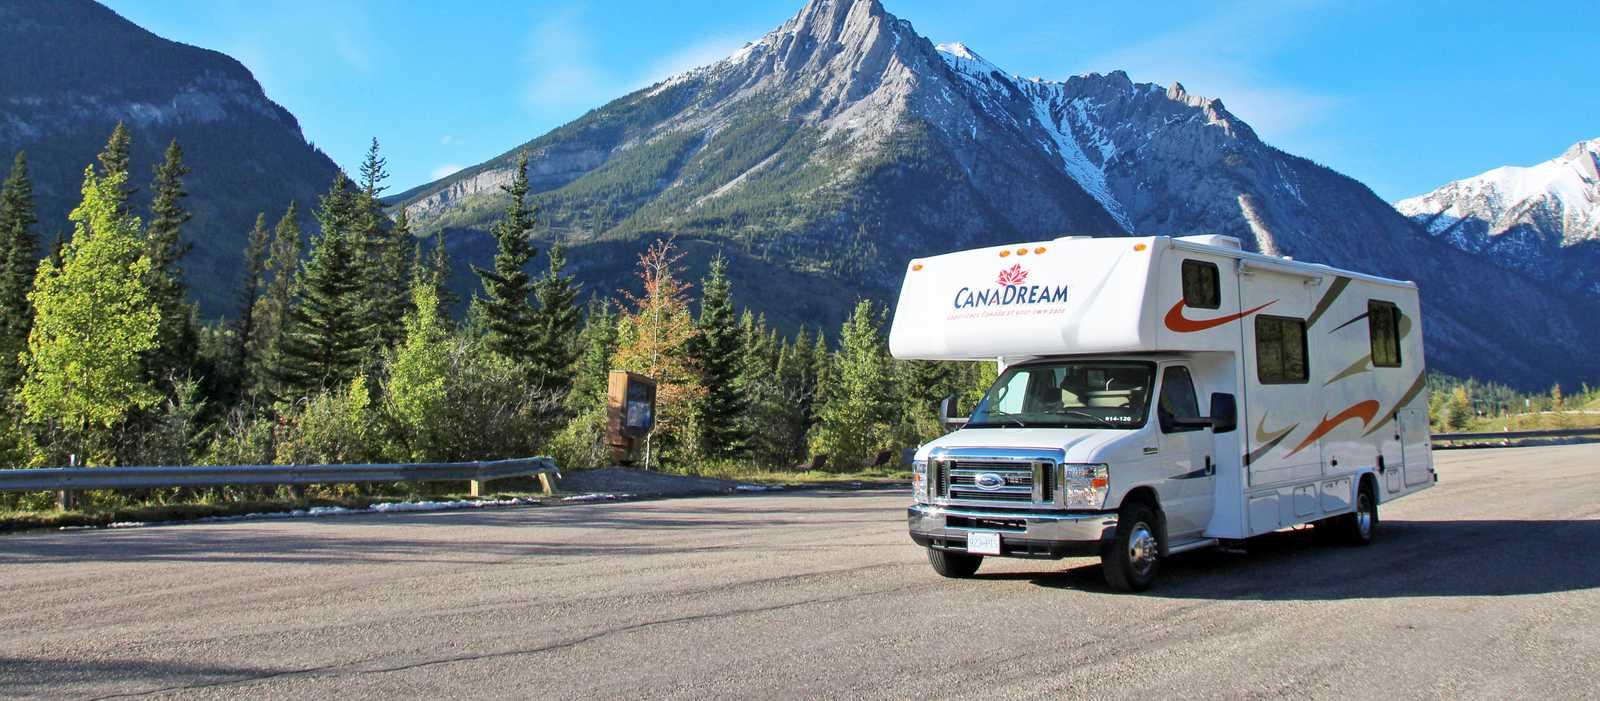 Das CanaDream MH-A Wohnmobil in Nakiska Kananaskis, Alberta